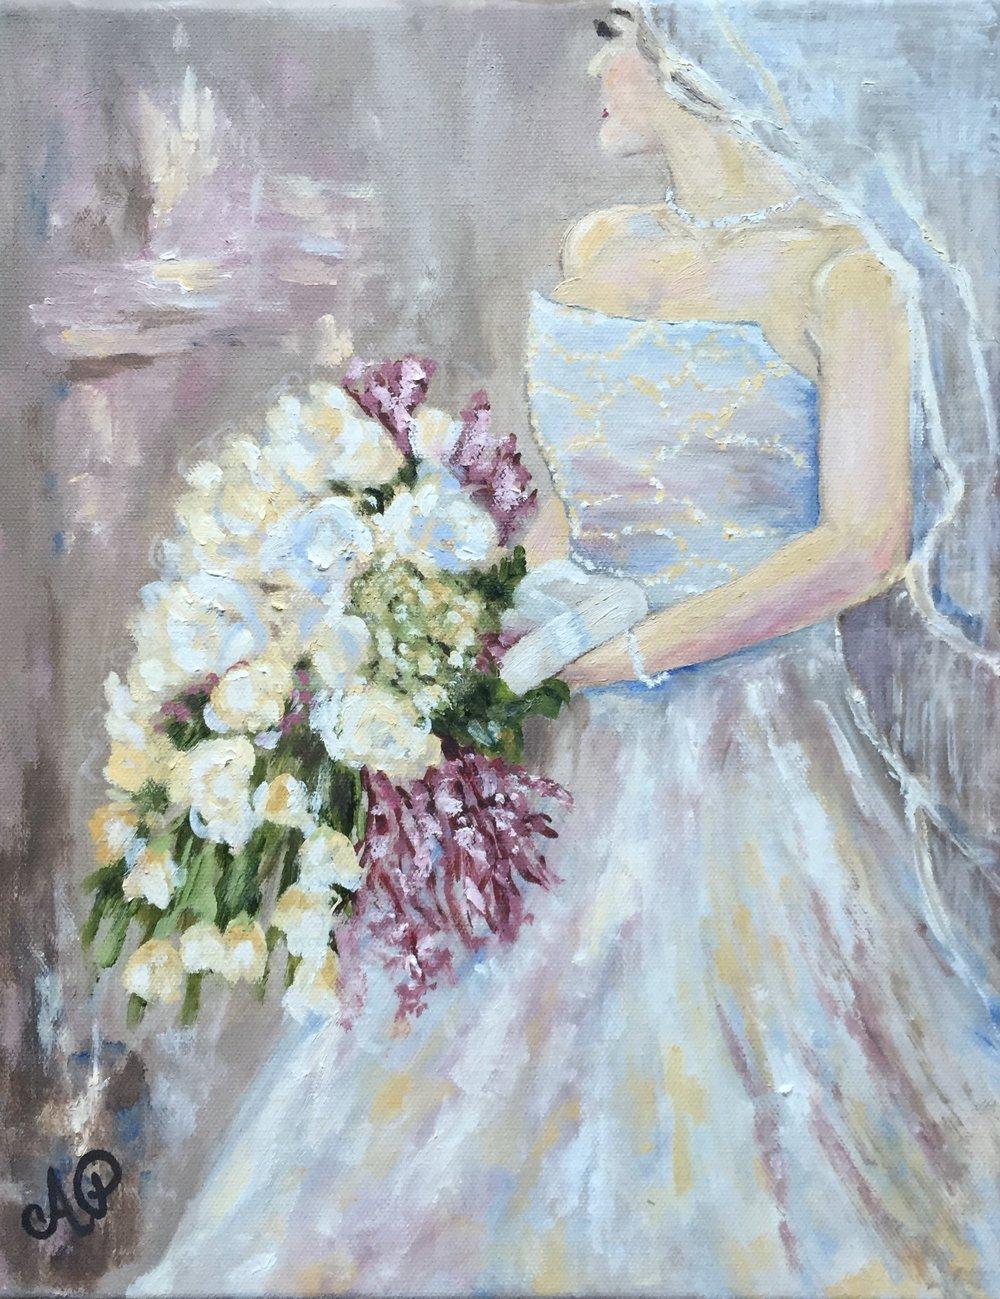 Leann Painting.JPG